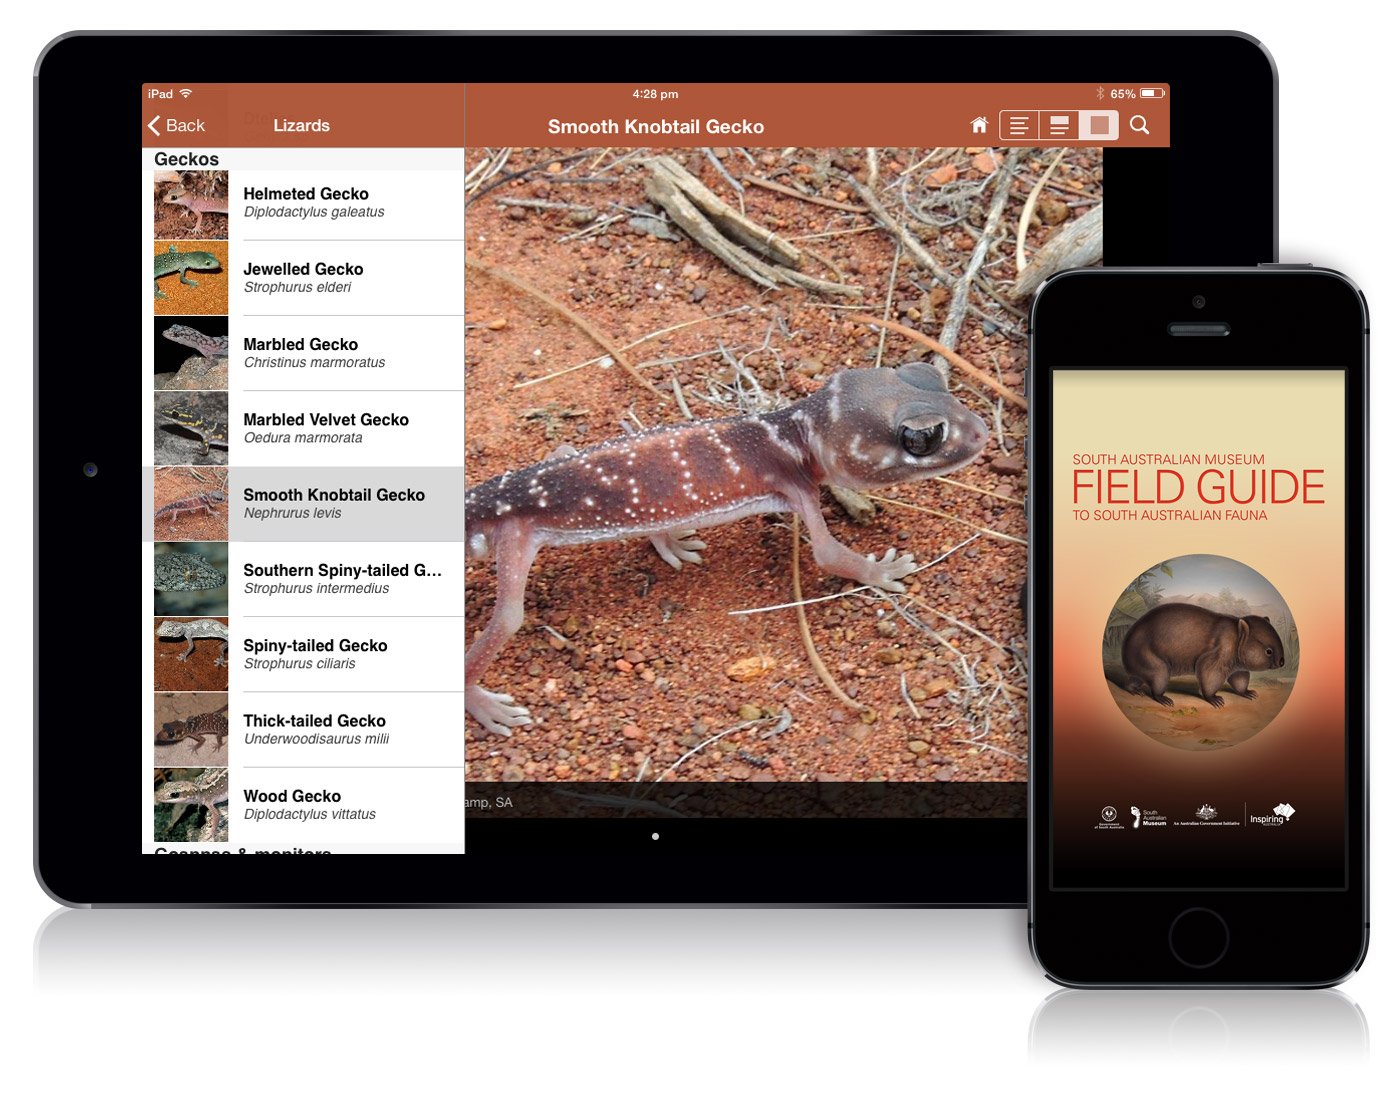 Field Guide to South Australian Fauna Book Cover